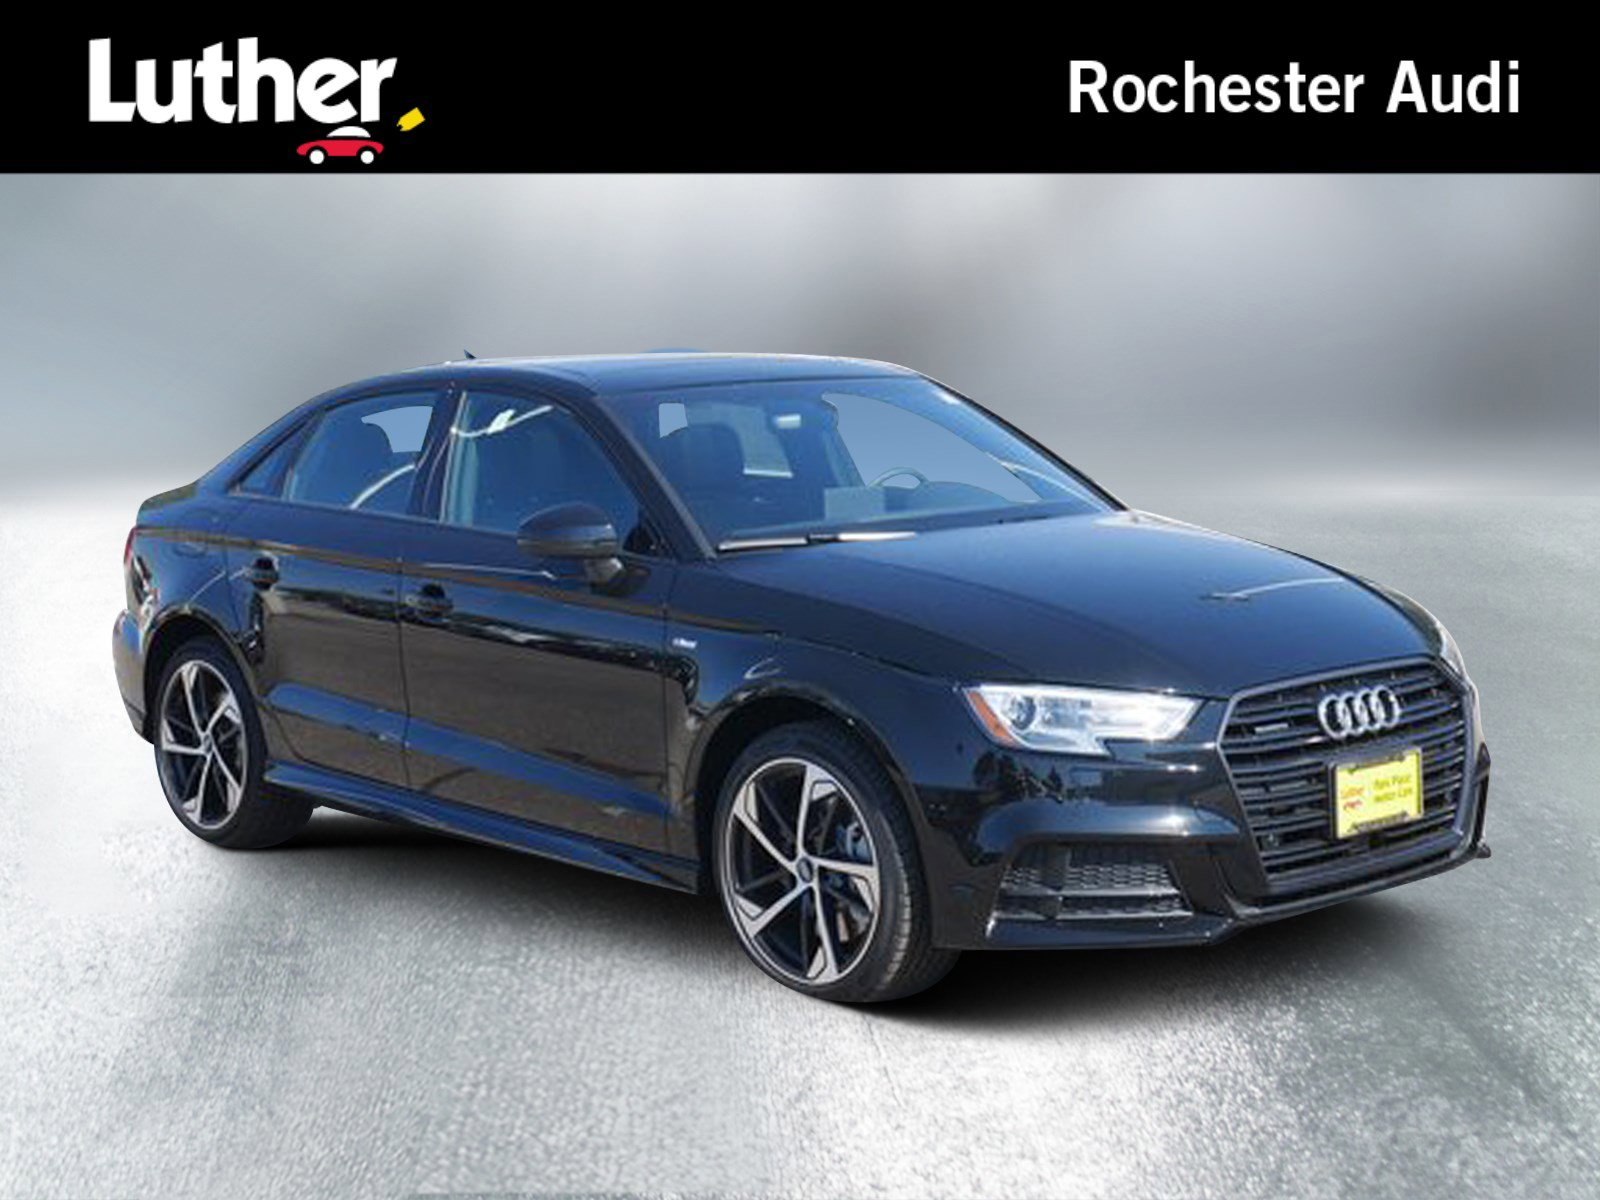 2020 Audi A3 Sedan Rochester MN